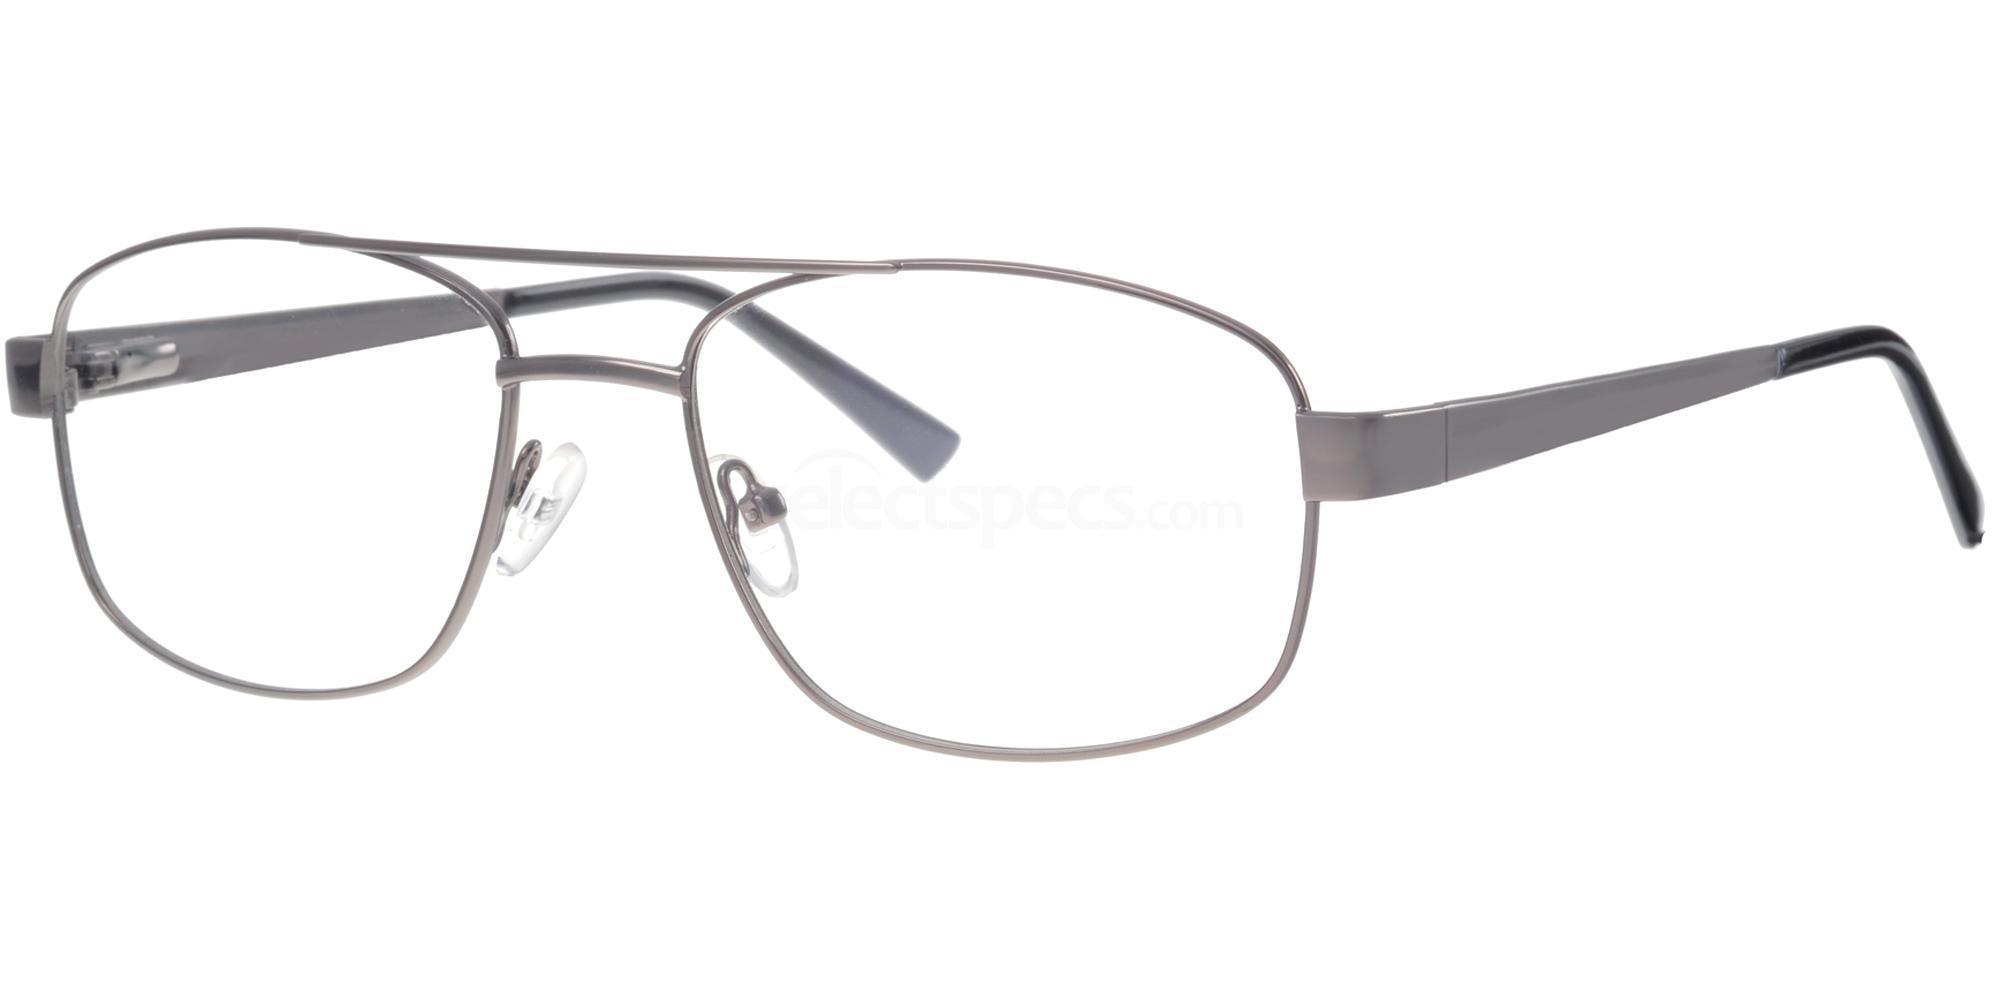 C10 4577 Glasses, Visage